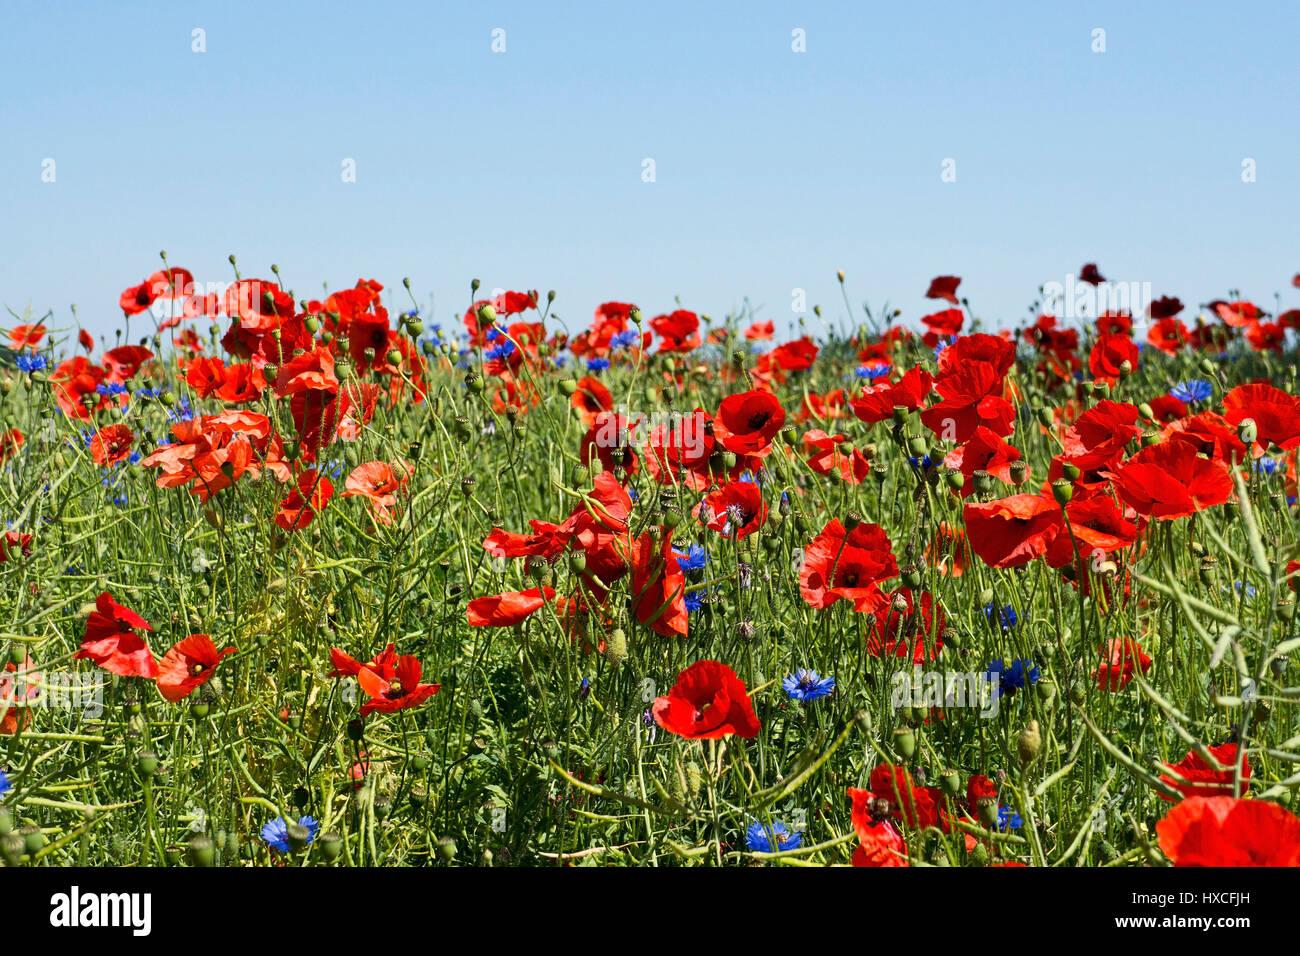 Clap poppy (Papaver rhoeas) and cornflowers (Centaurea cyanus) on a field in Mecklenburg-West Pomerania, Poppies - Stock Image